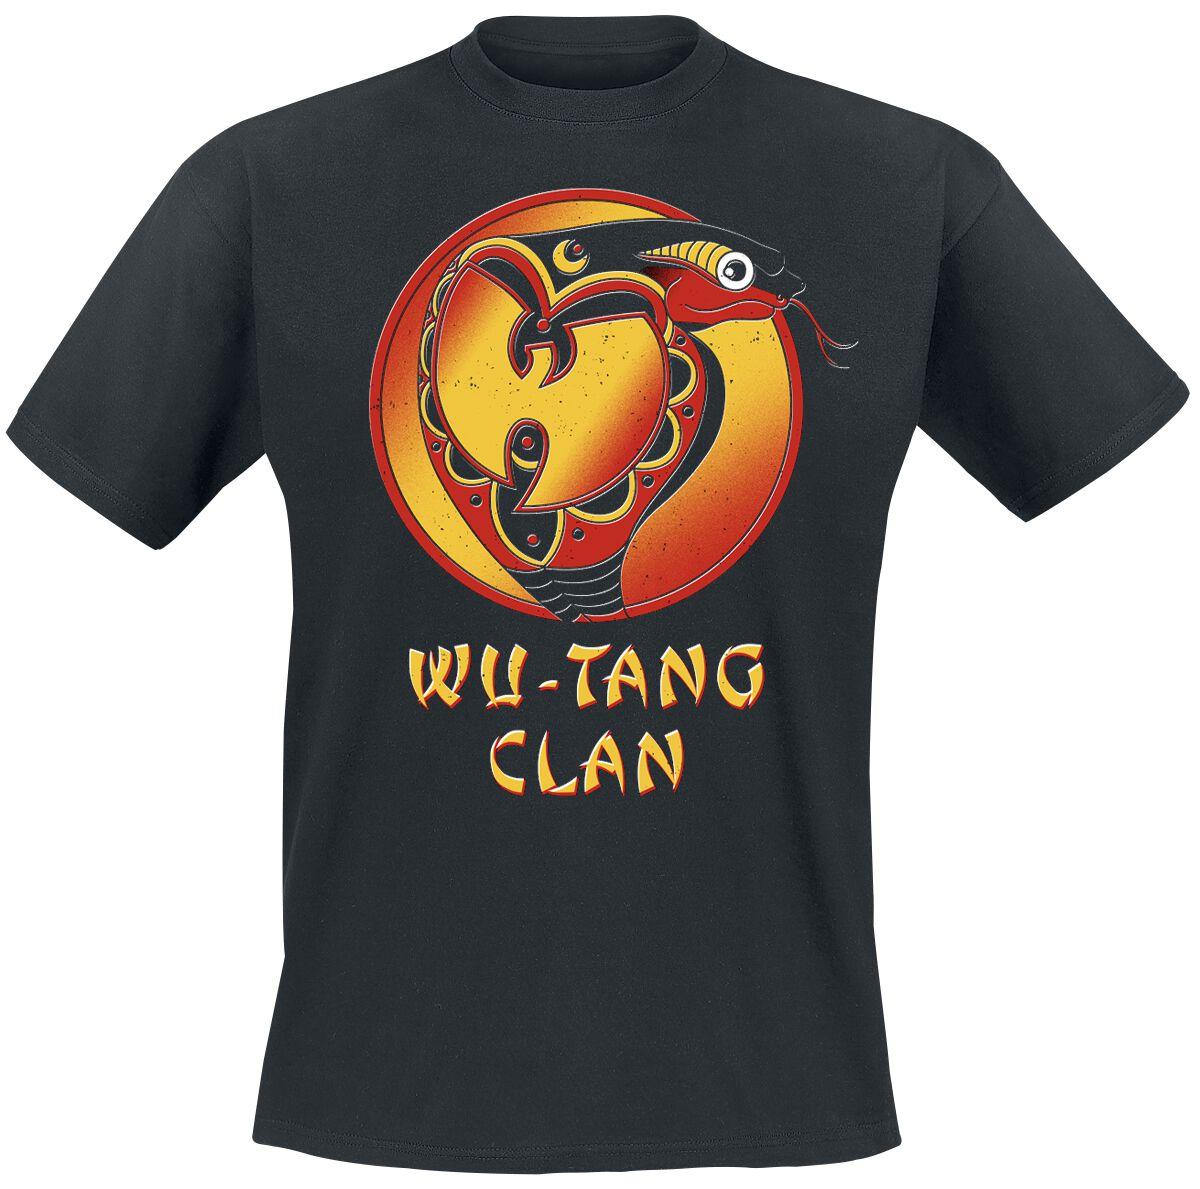 Zespoły - Koszulki - T-Shirt Wu Tang Clan Black Cobra Logo T-Shirt czarny - 363140